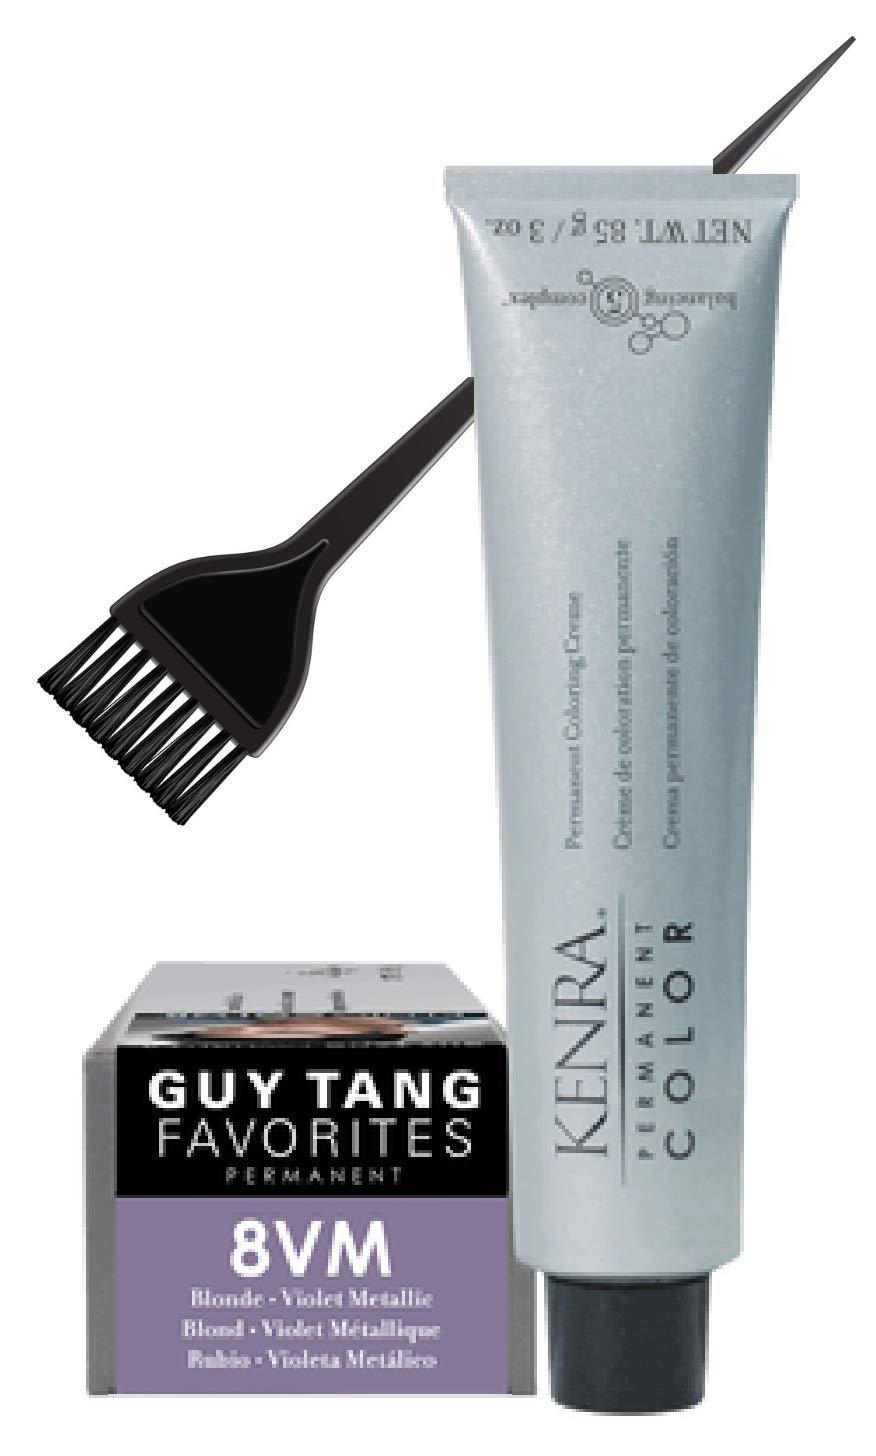 Kenrä Permanent Color Coloring Creme Haircolor, METALLIC SERIES, Balancing 5 Complex, 3 oz (w/Sleek Tint Brush) Cream Hair Color Dye, Guy Tang Favorites (8VM Violet Metallic)